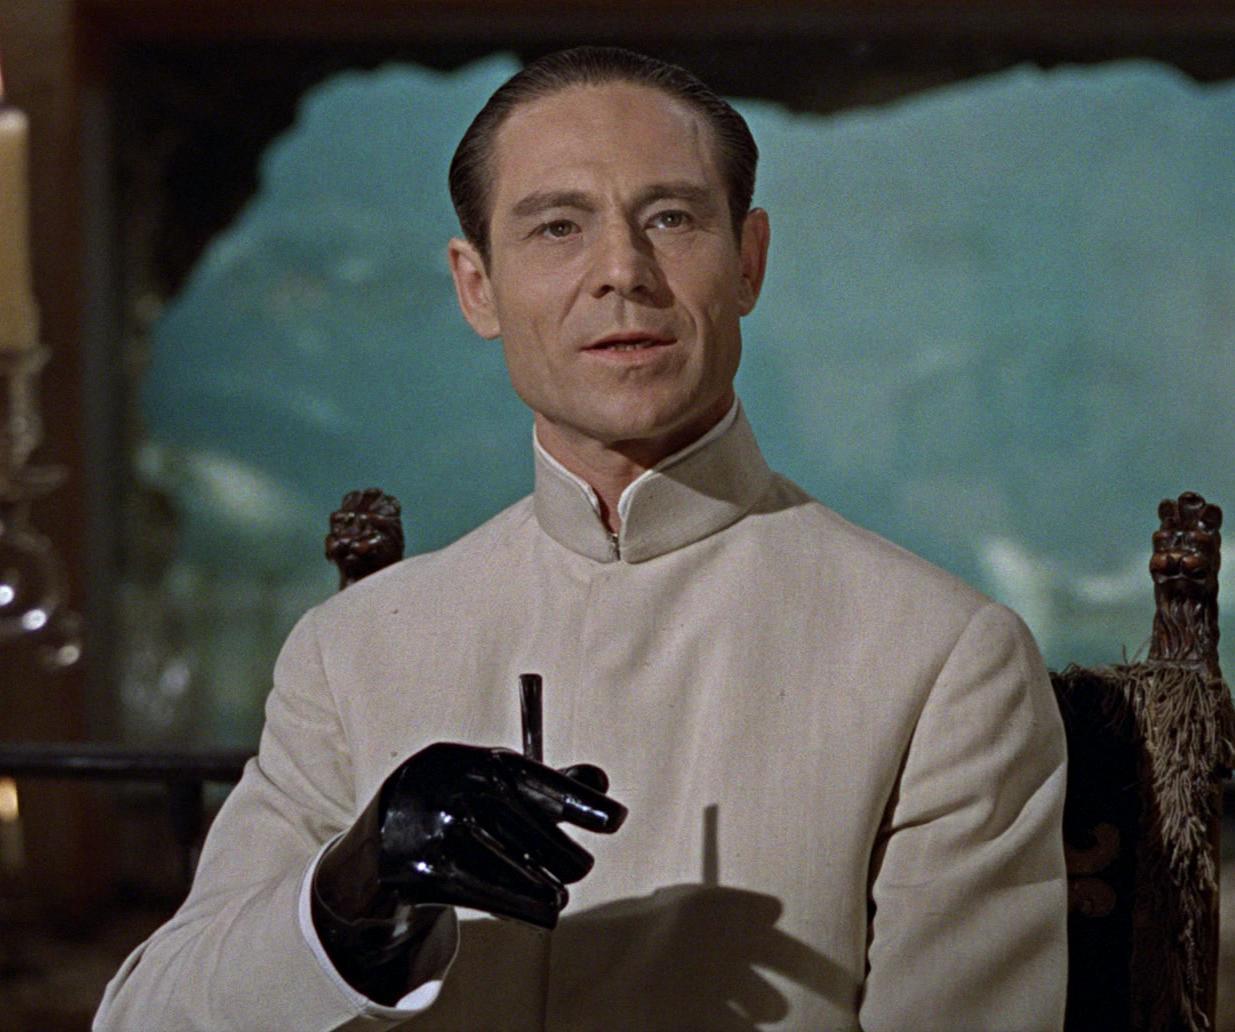 MV5BMTVlNTNkZmUtZjlmZC00OTkwLTk3ODMtMWQ2YjZkYWFiOGU2L2ltYWdlL2ltYWdlXkEyXkFqcGdeQXVyMjk3NTUyOTc@. V1 30 Things You Probably Didn't Know About The James Bond Films